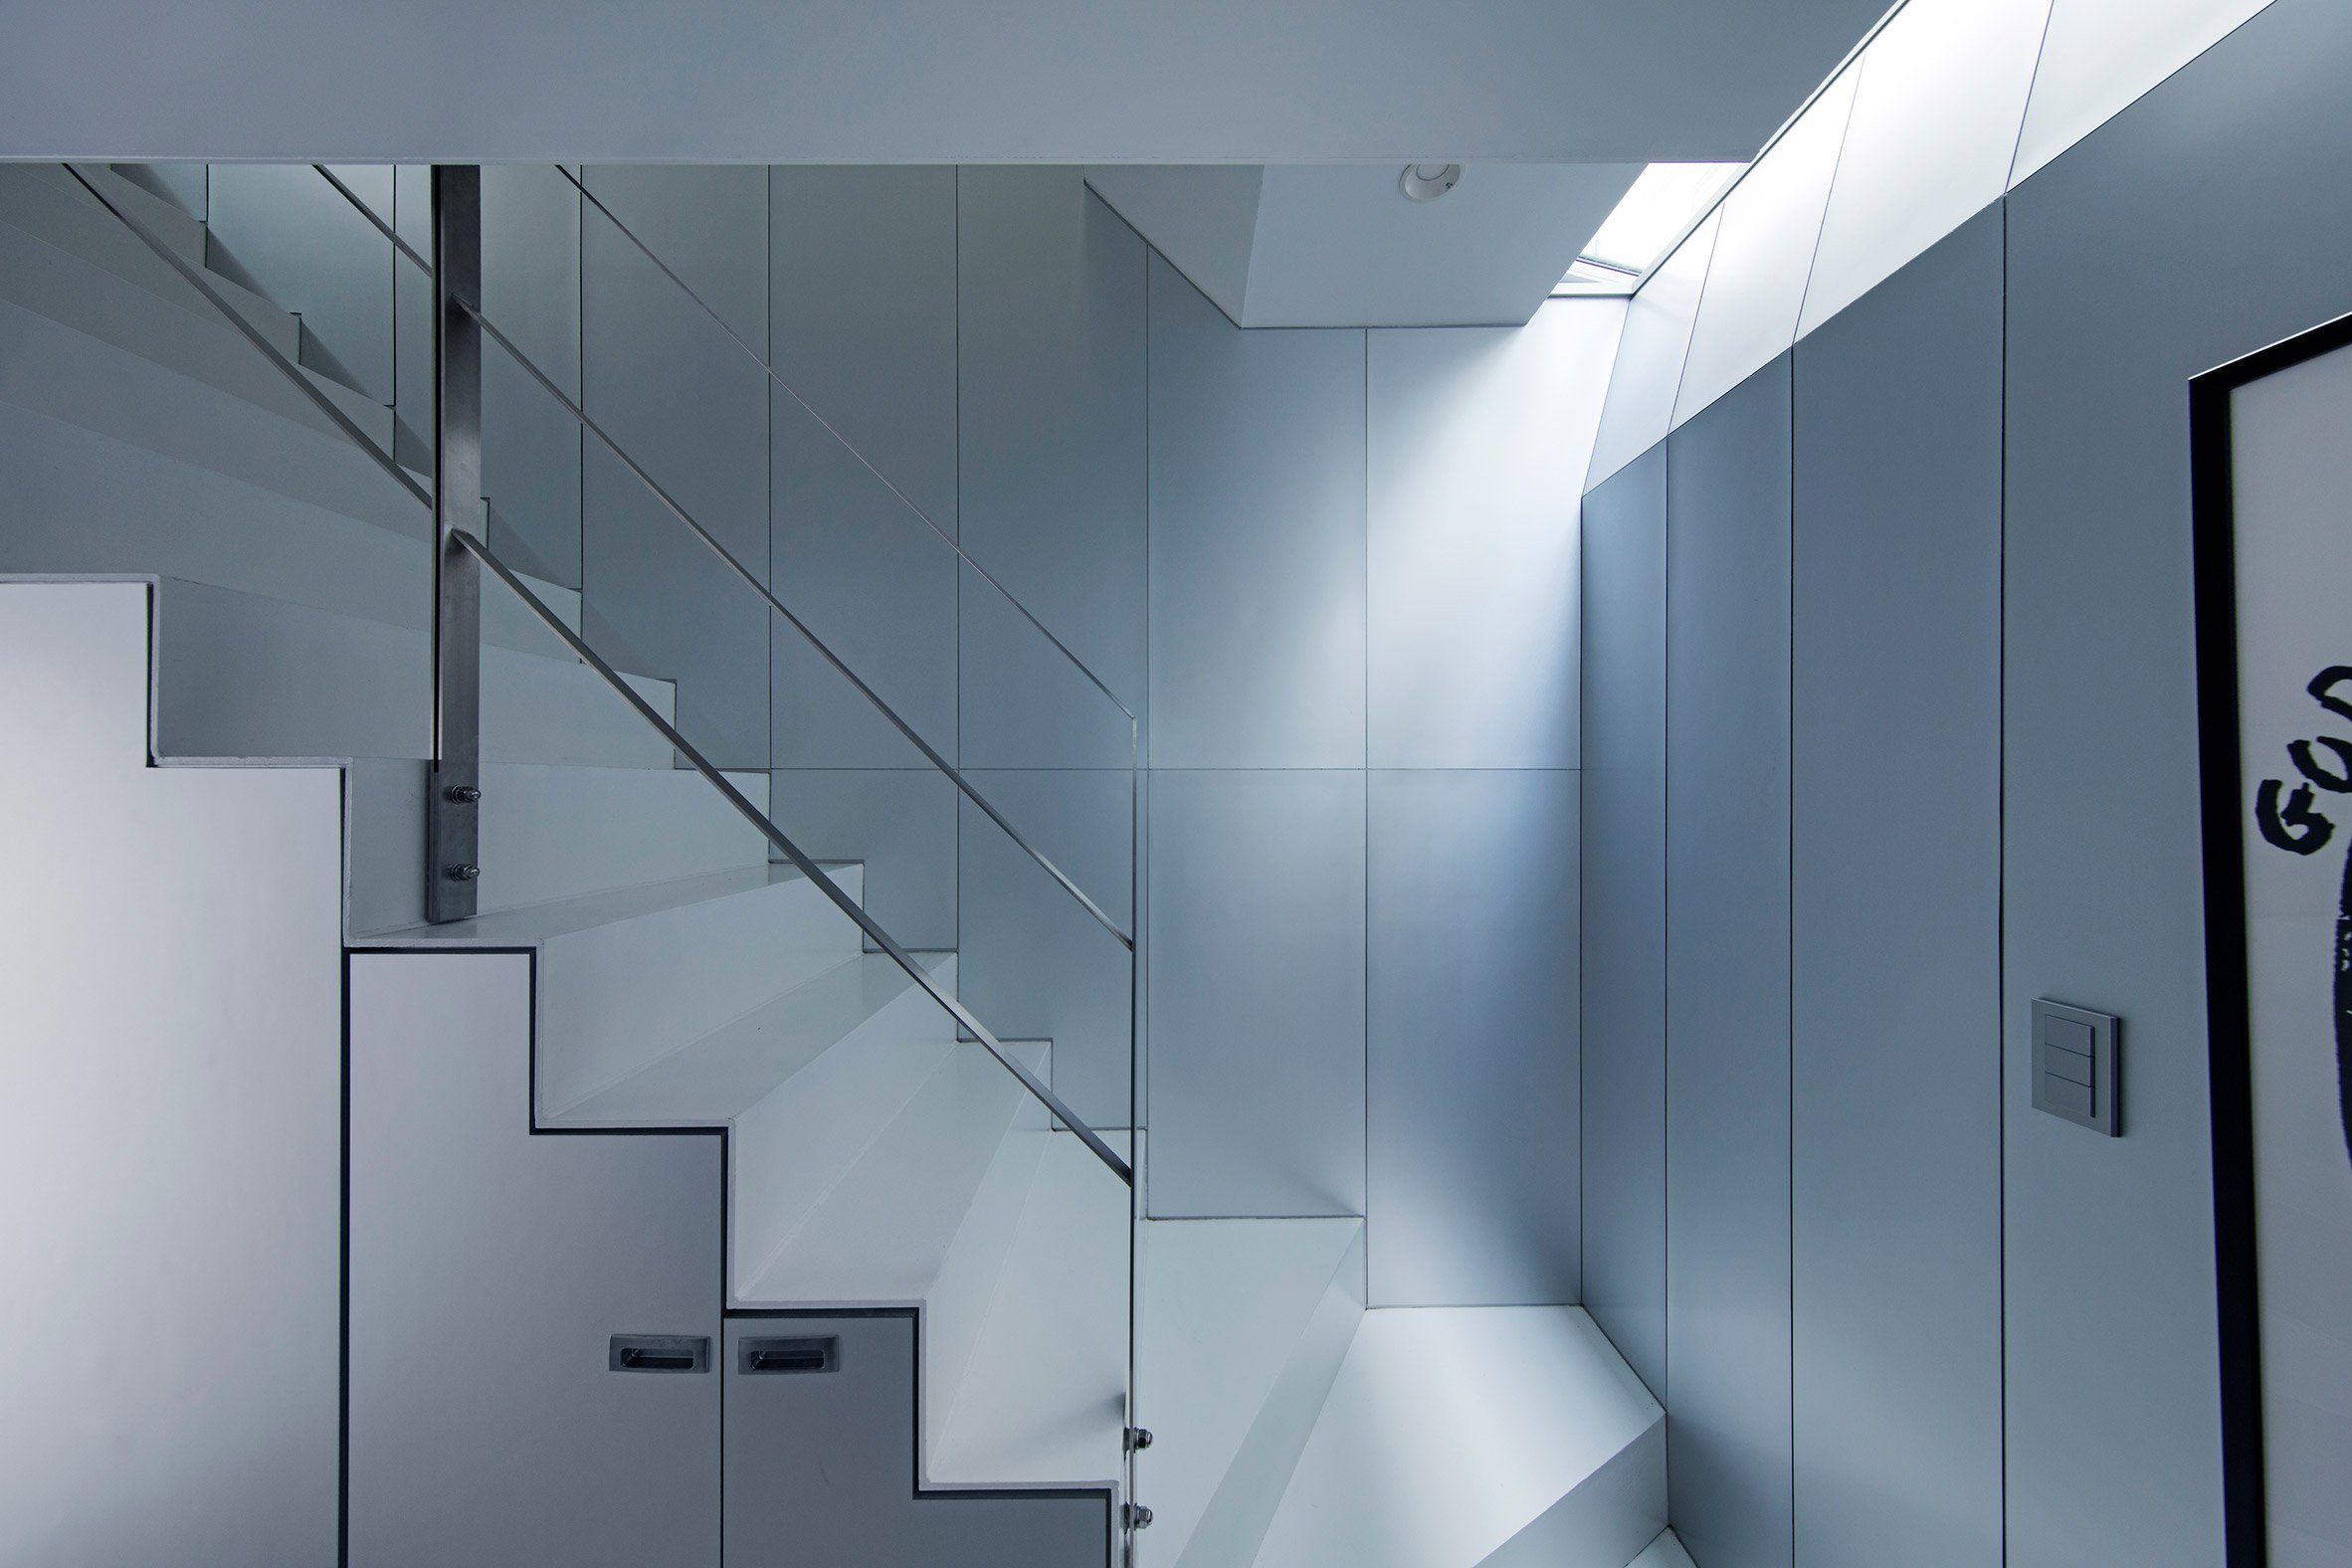 shinbohon-house-k-yuichi-yoshida-associates-architecture-residential-japan-_dezeen_2364_col_16.jpg